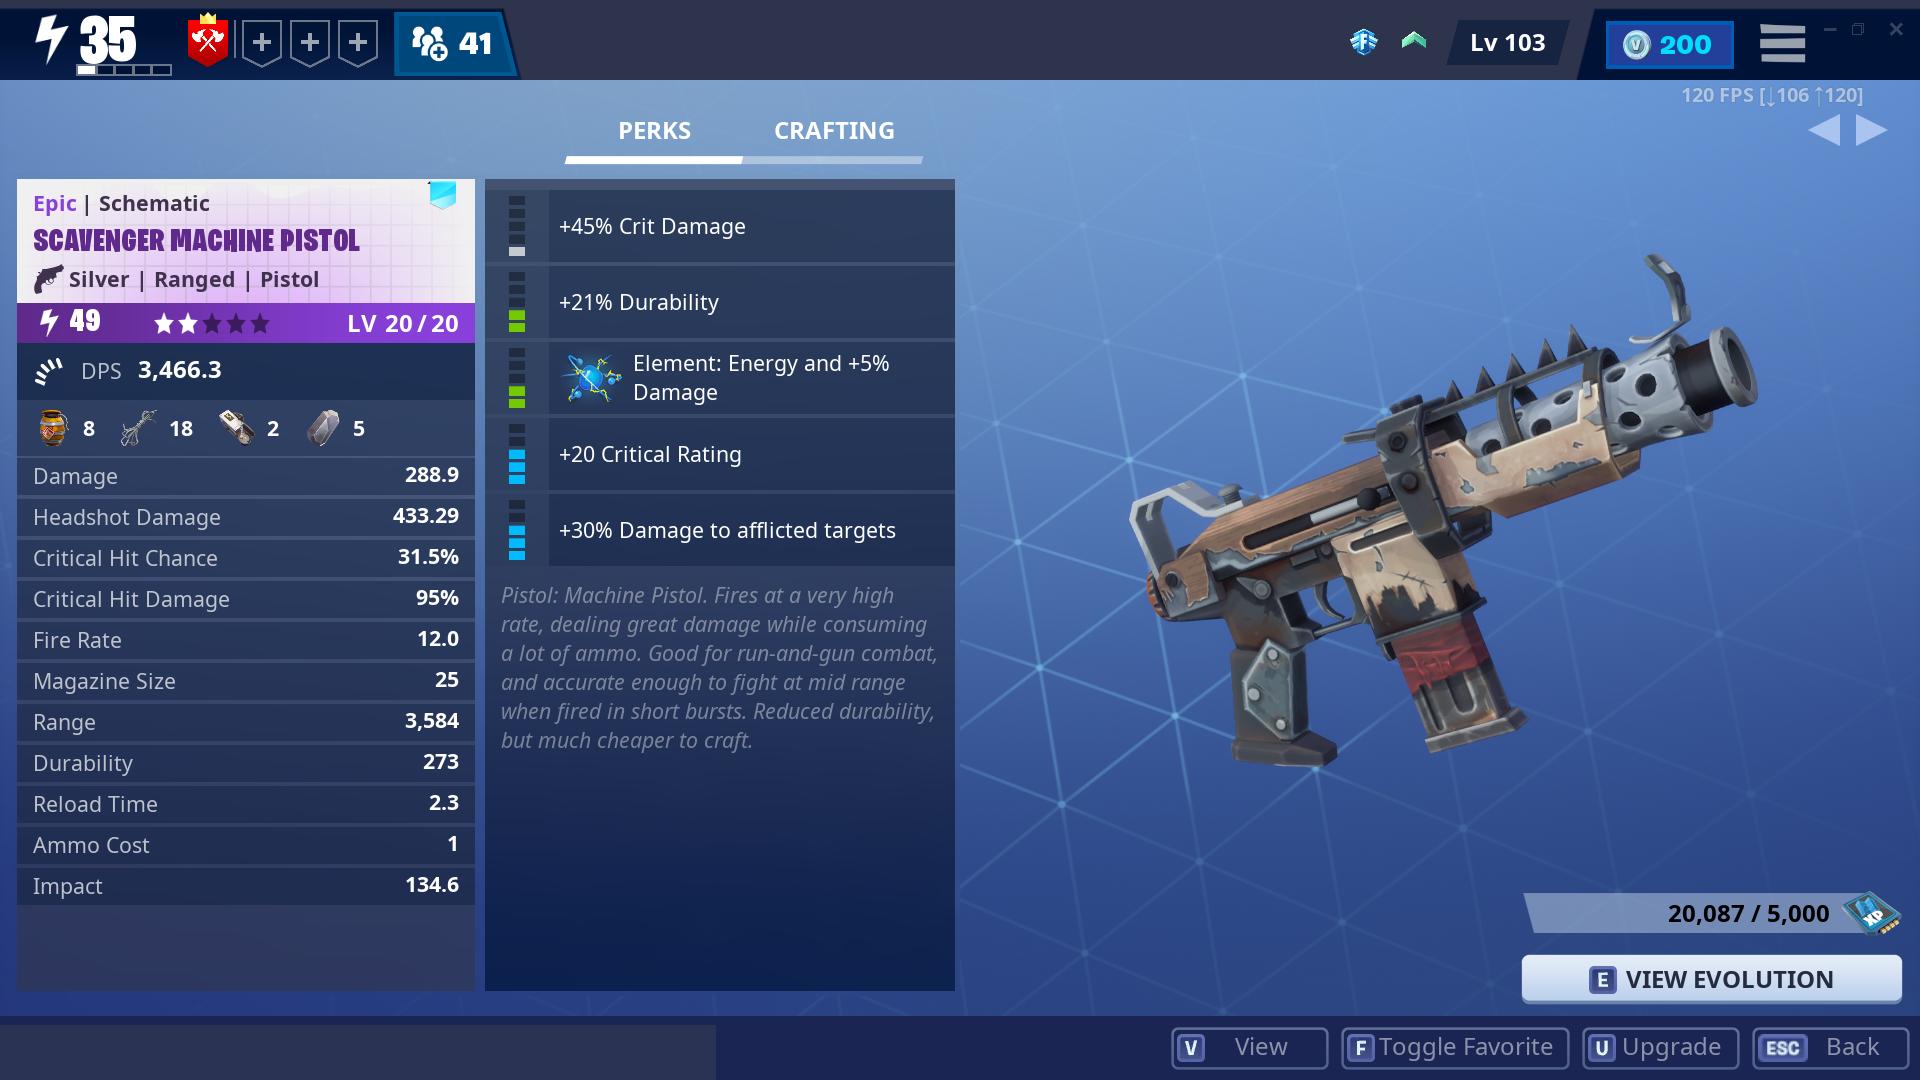 3 Scavenger Machine Pistols 49